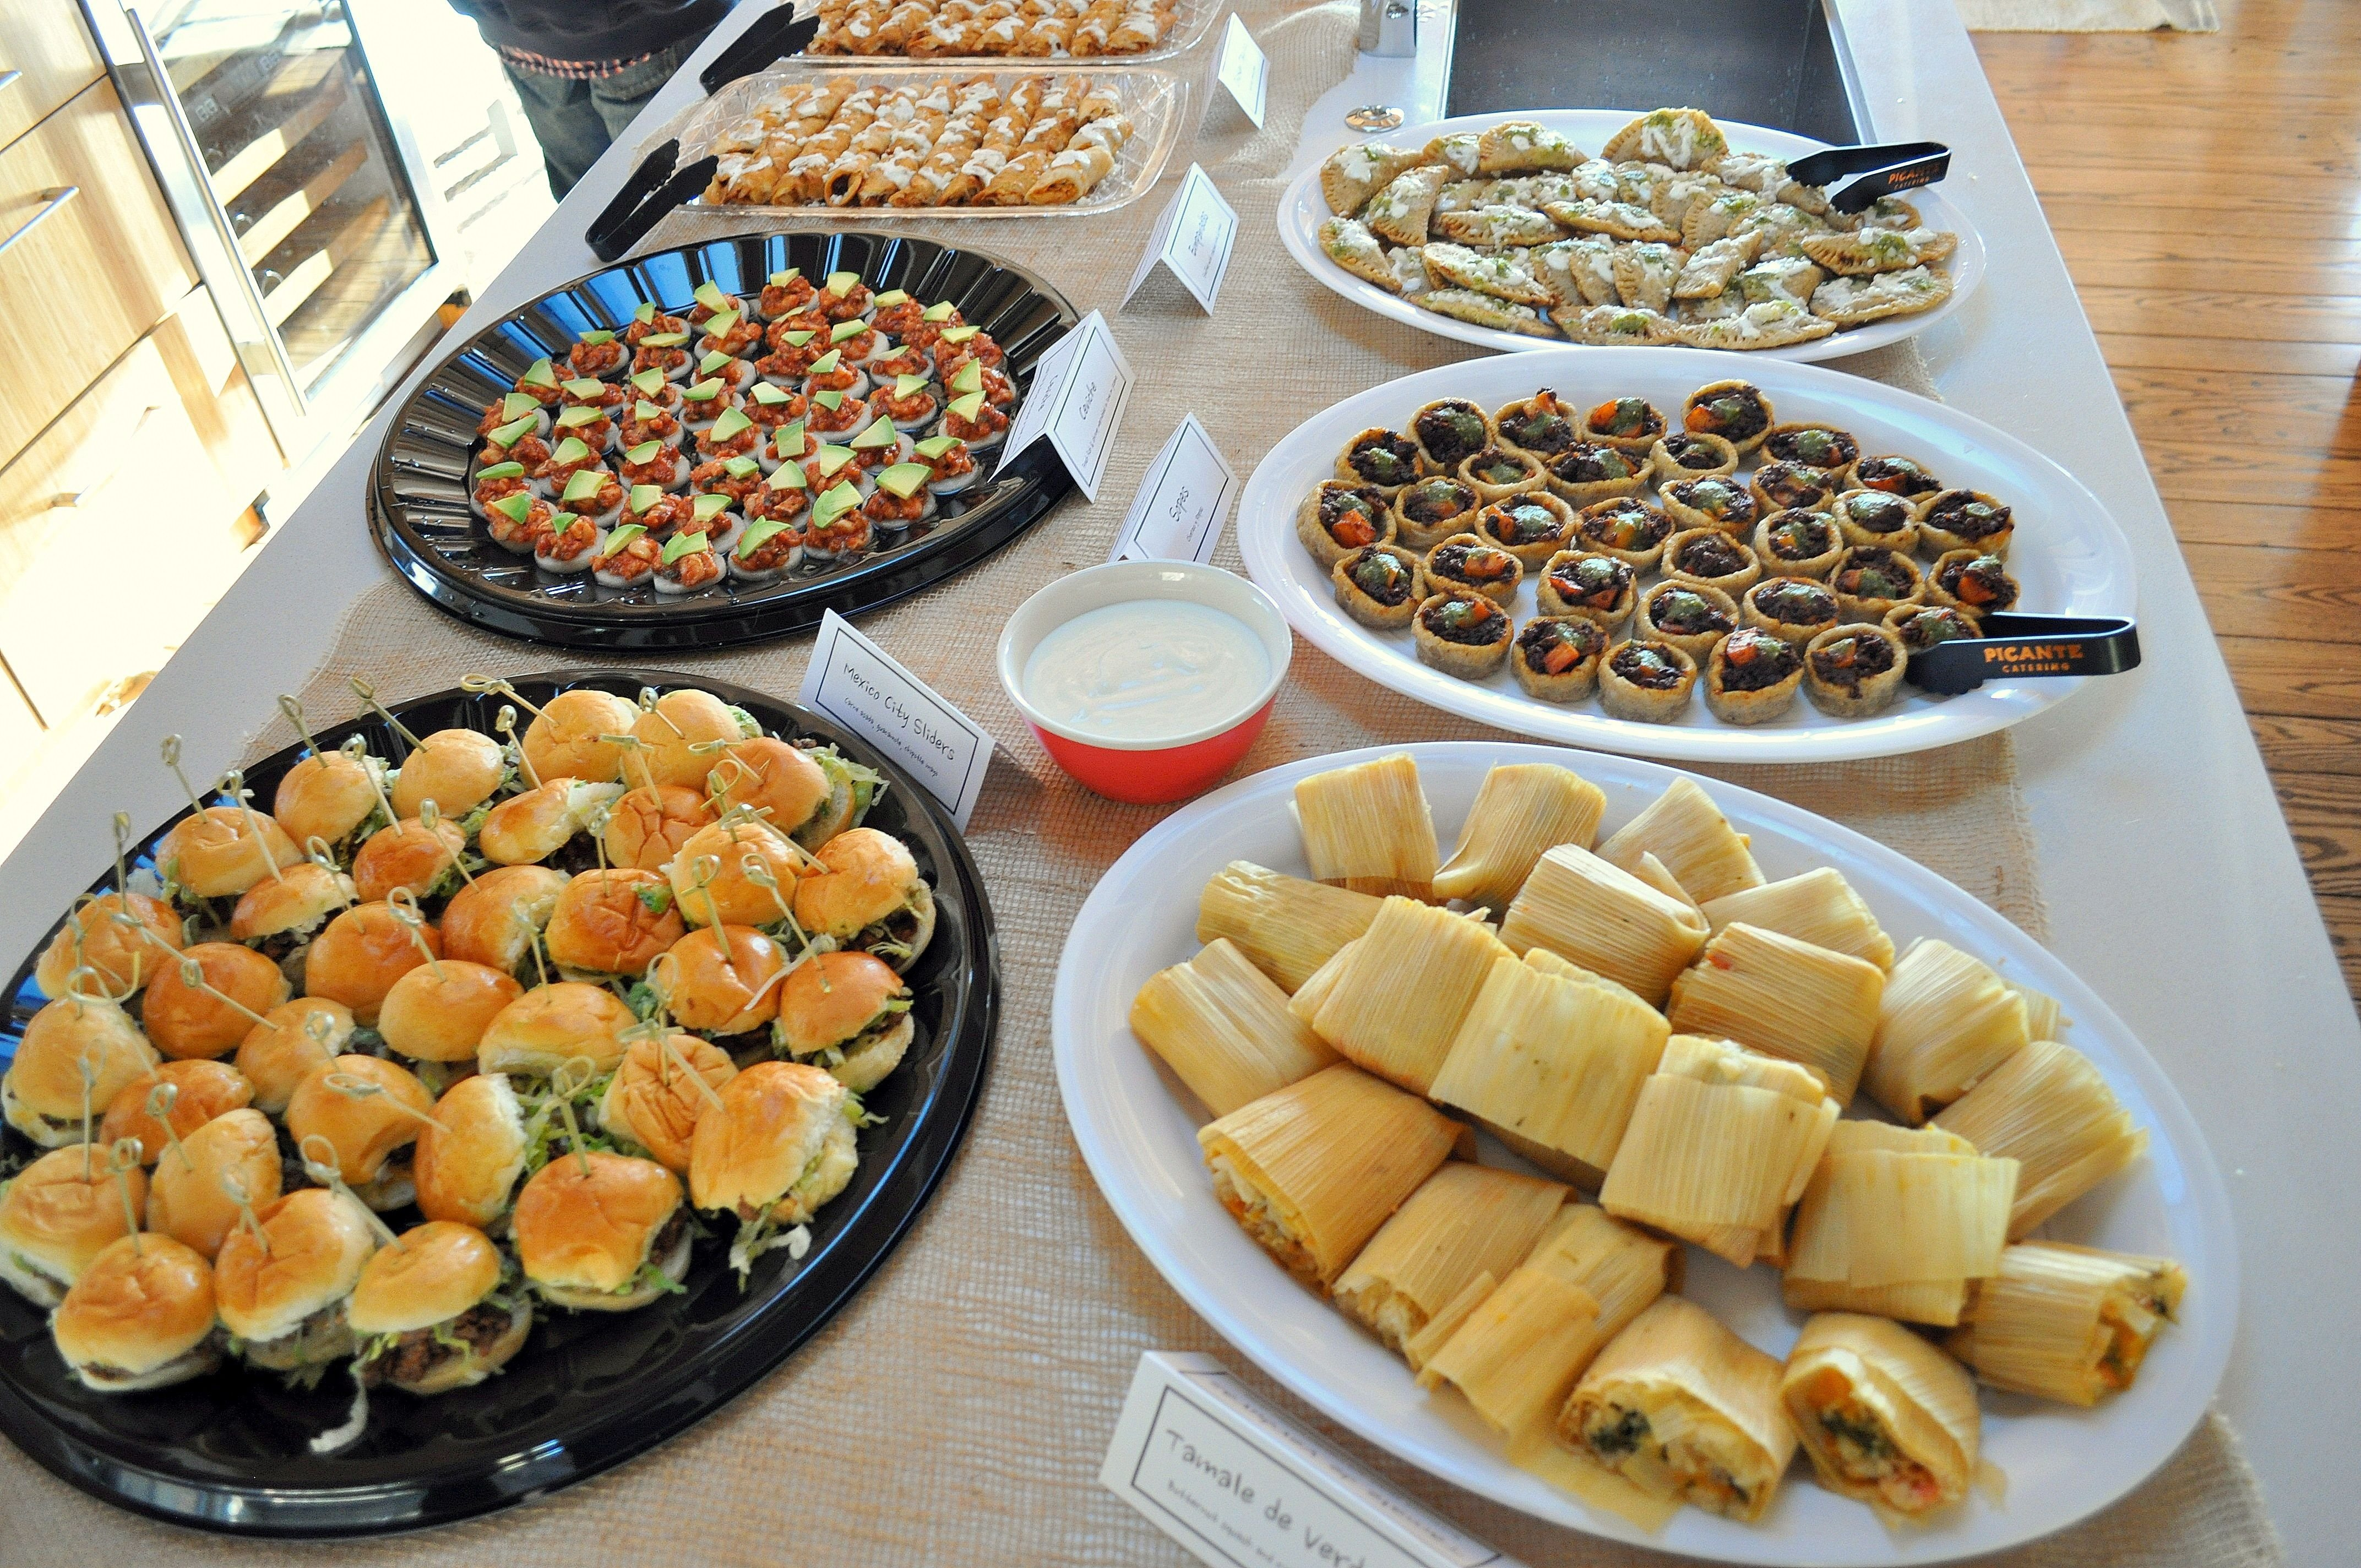 10 Attractive Unique Baby Shower Food Ideas pinrosie on baby shower food ideas pinterest baby shower foods 1 2020